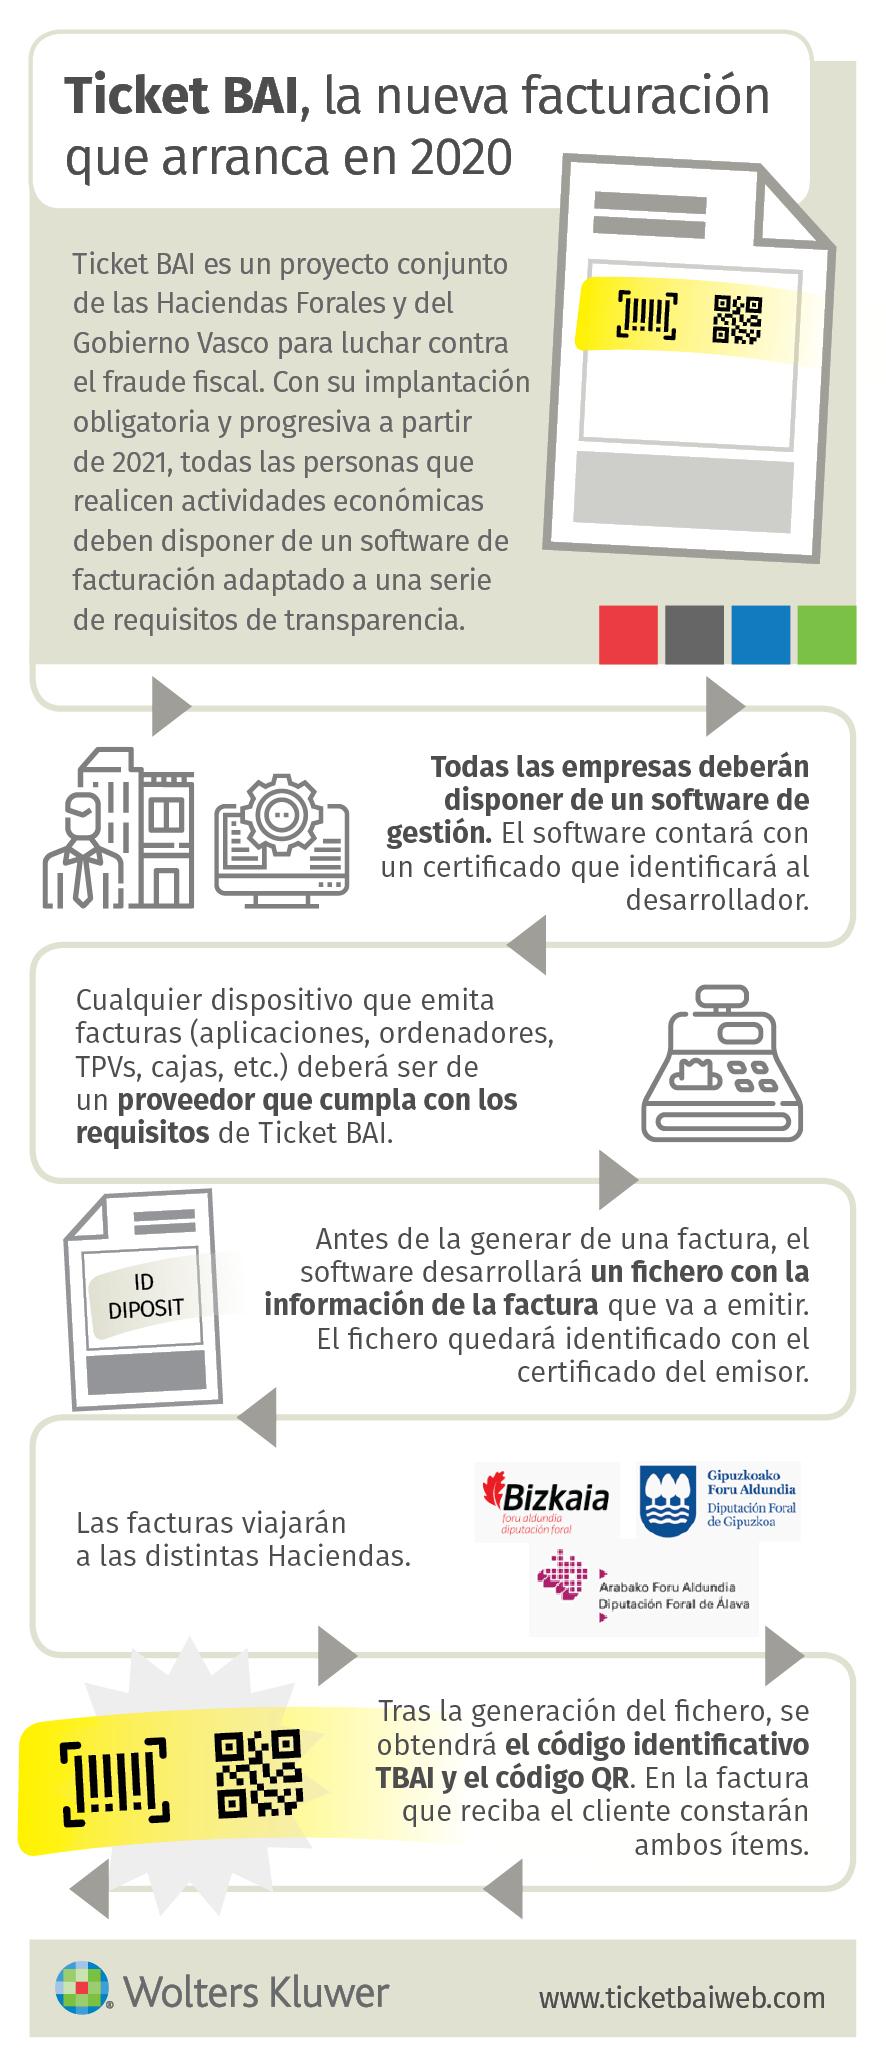 Nuevo sistema de facturación con Ticket BAI